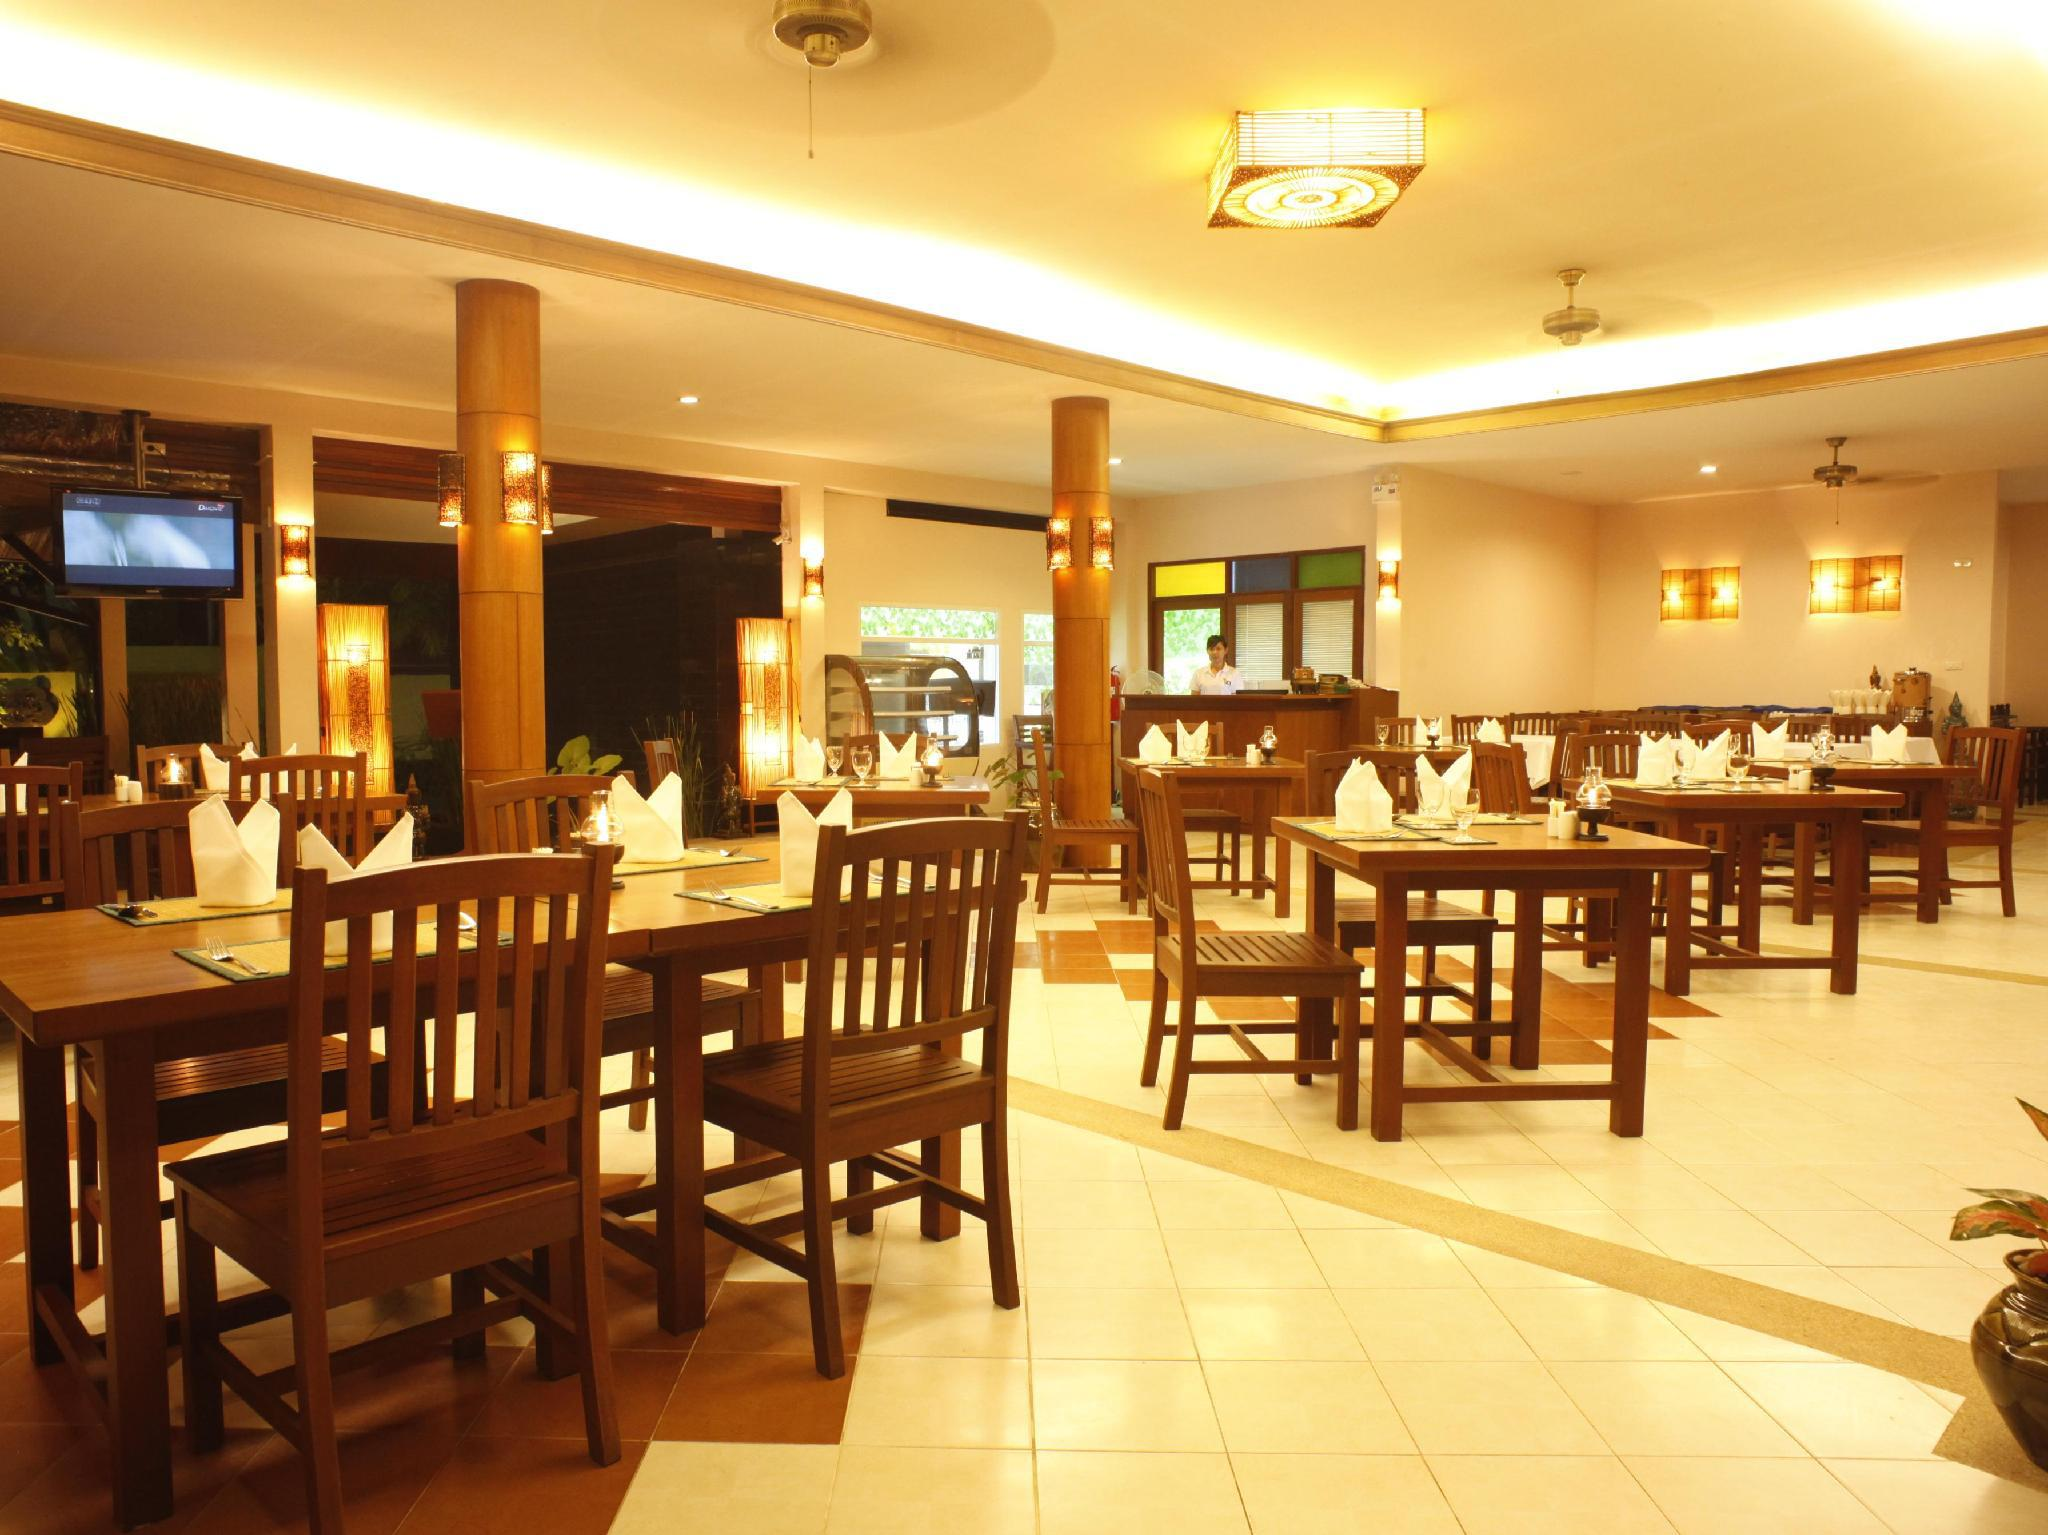 Fanari Khaolak Resort - Courtyard Zone ฟานารี่ เขาหลัก รีสอร์ท คอร์ตยาร์ด โซน